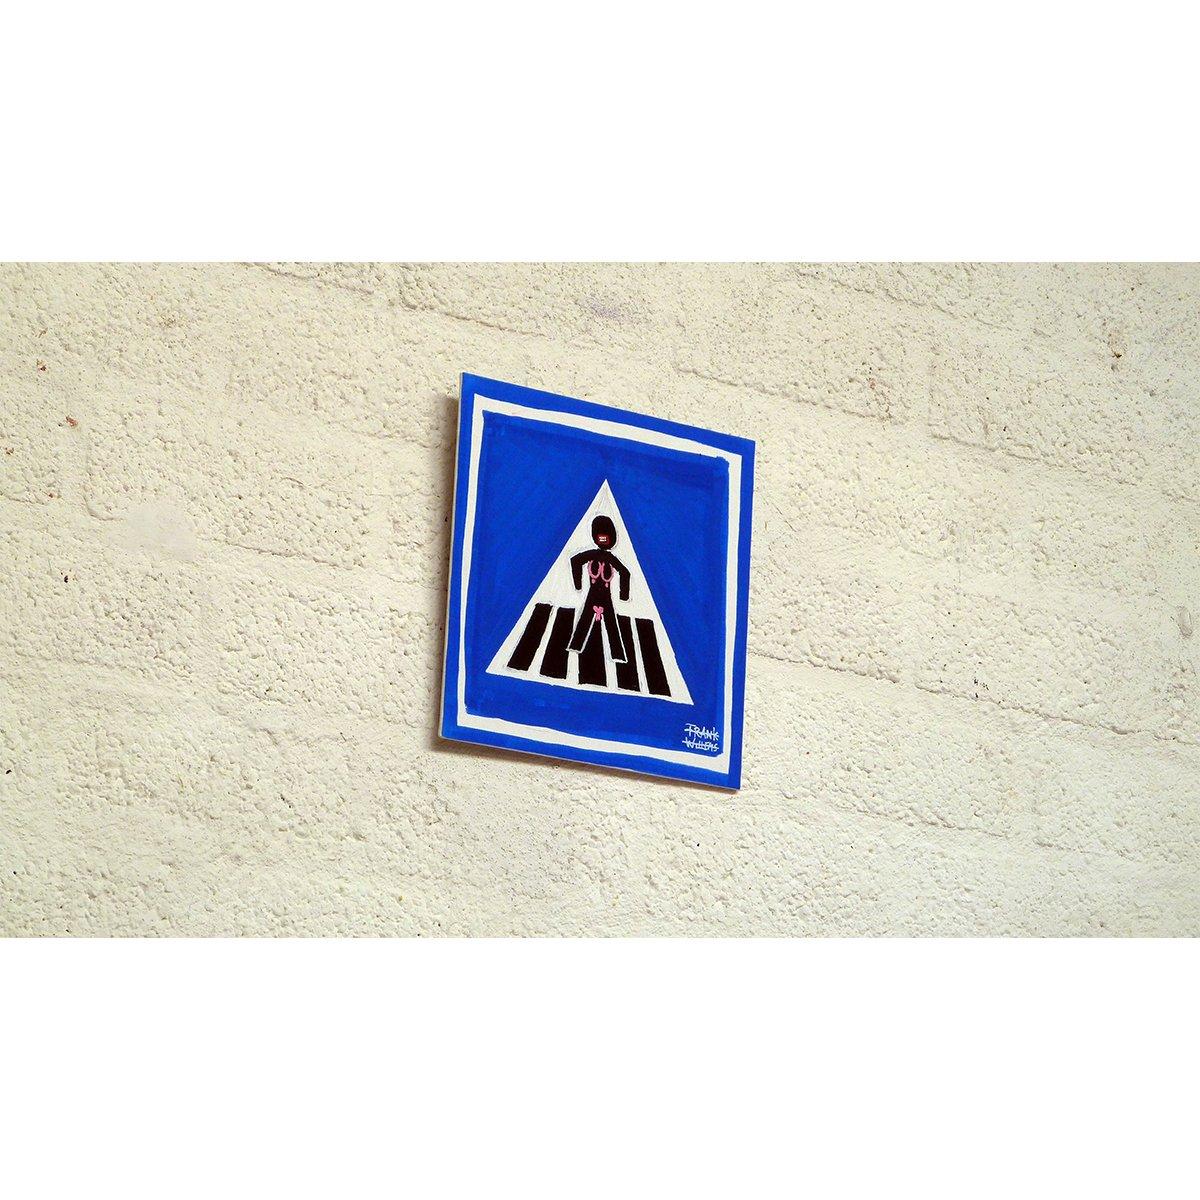 GENDER NEUTRAL ROAD SIGNS 02 - Frank Willems